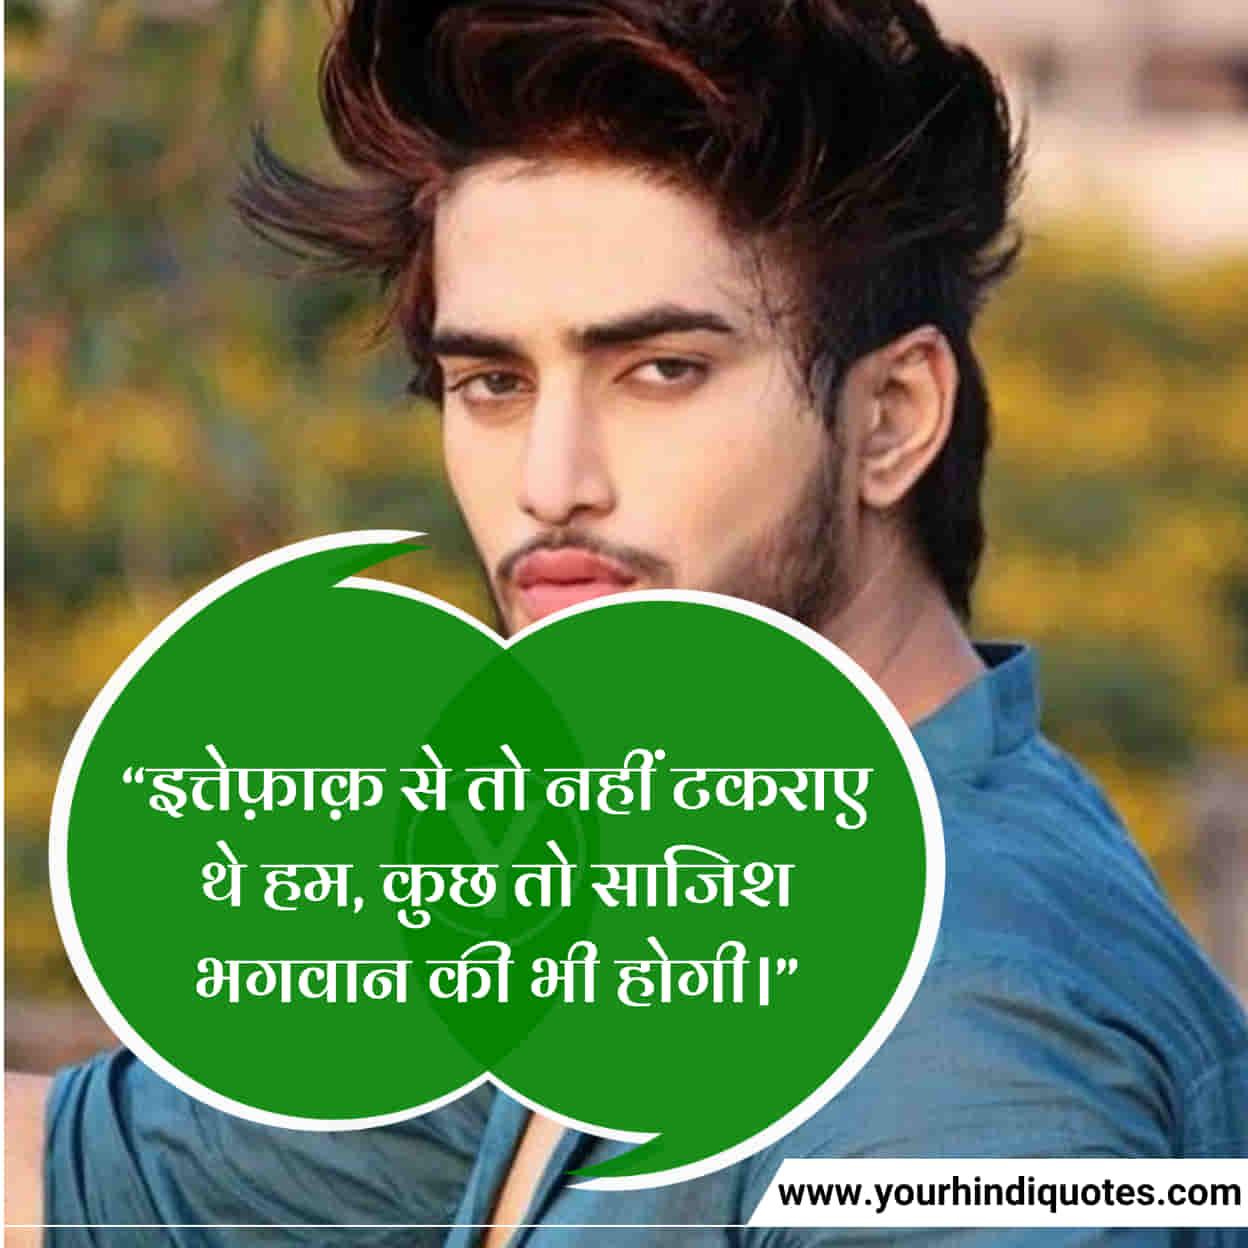 Sad Love Fb Status In Hindi